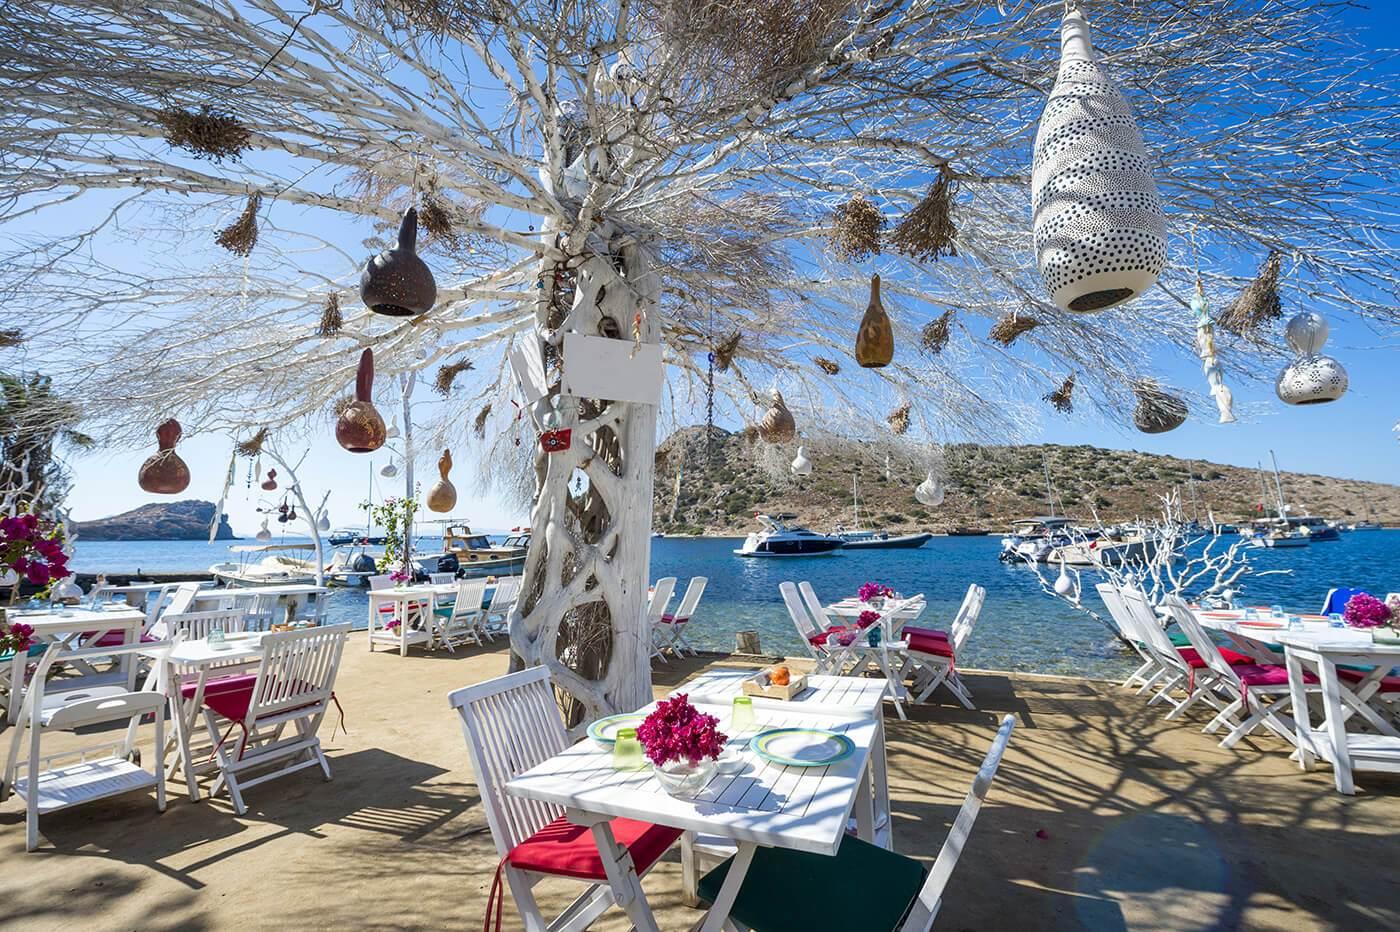 Informal beachside seating with decorative tree in a scenic tourist village near Bodrum, Turkey